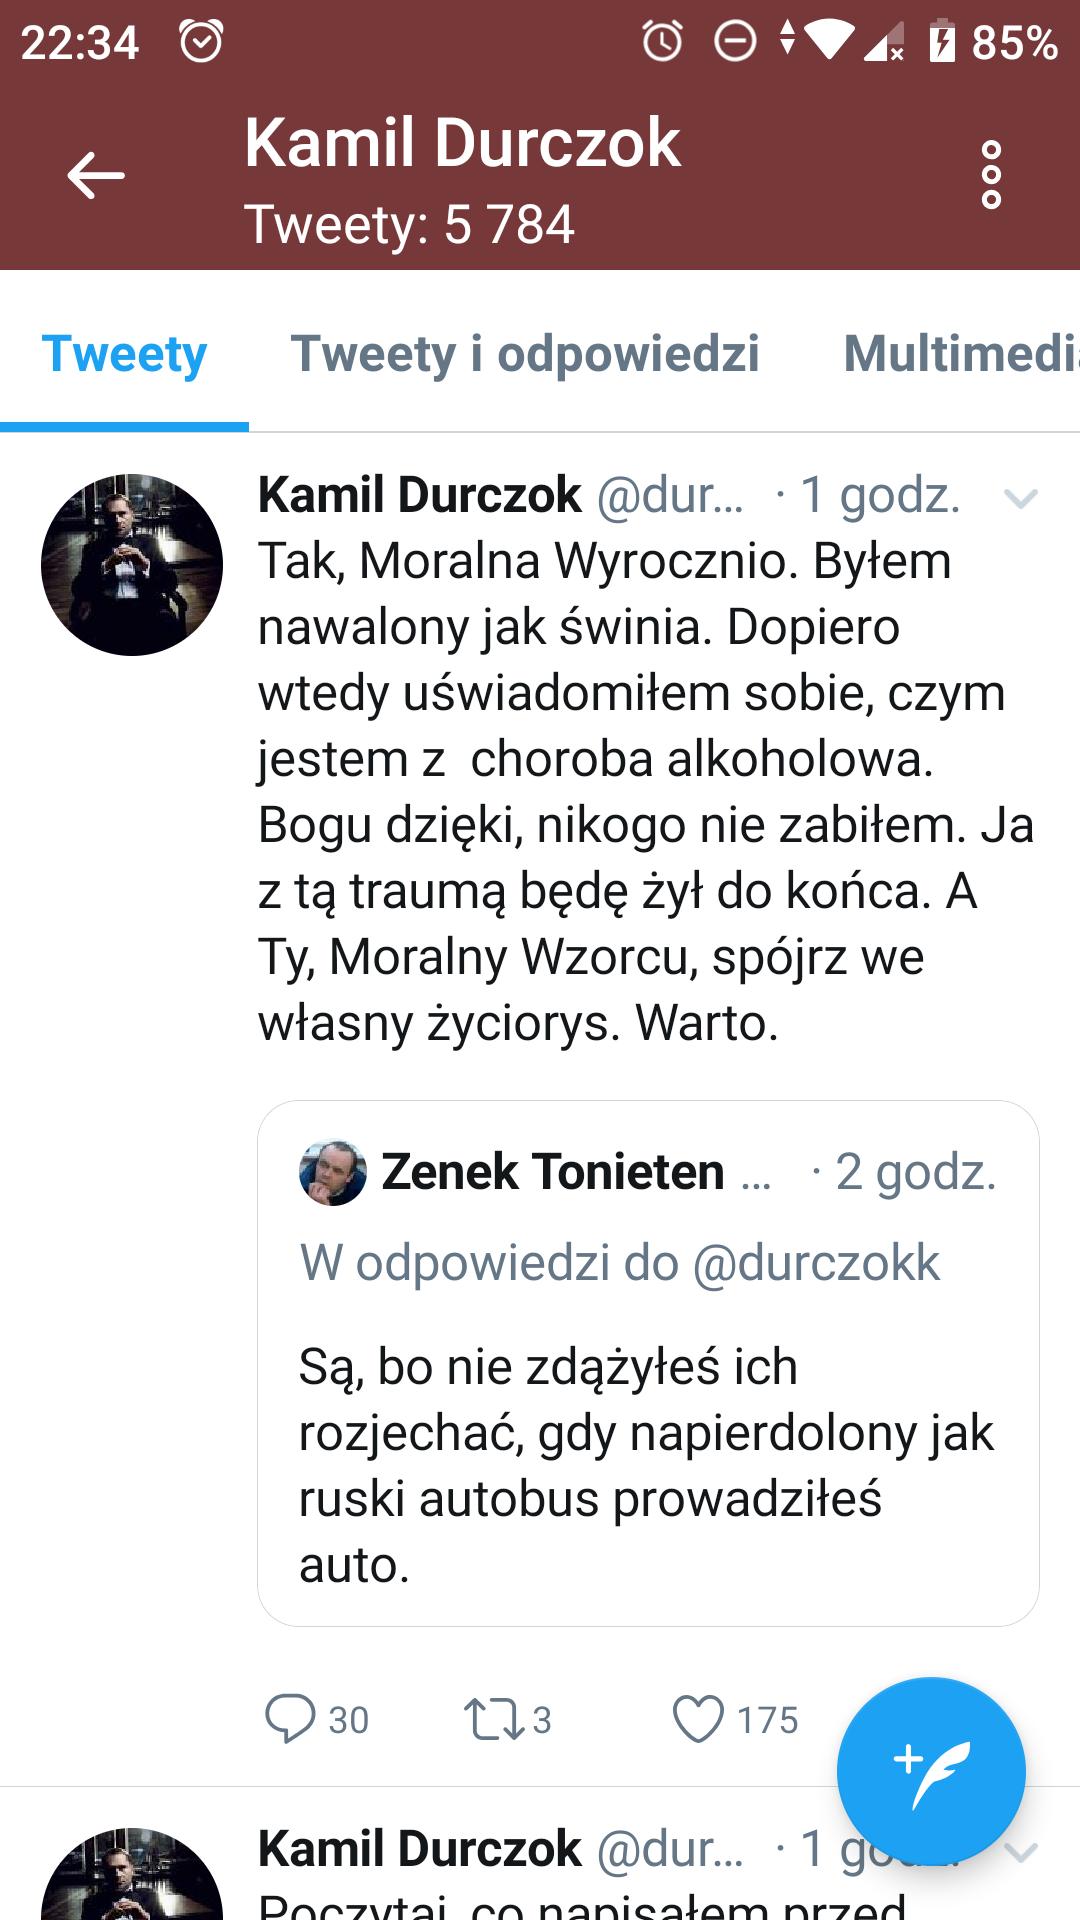 Kamil Durczok/Twitter